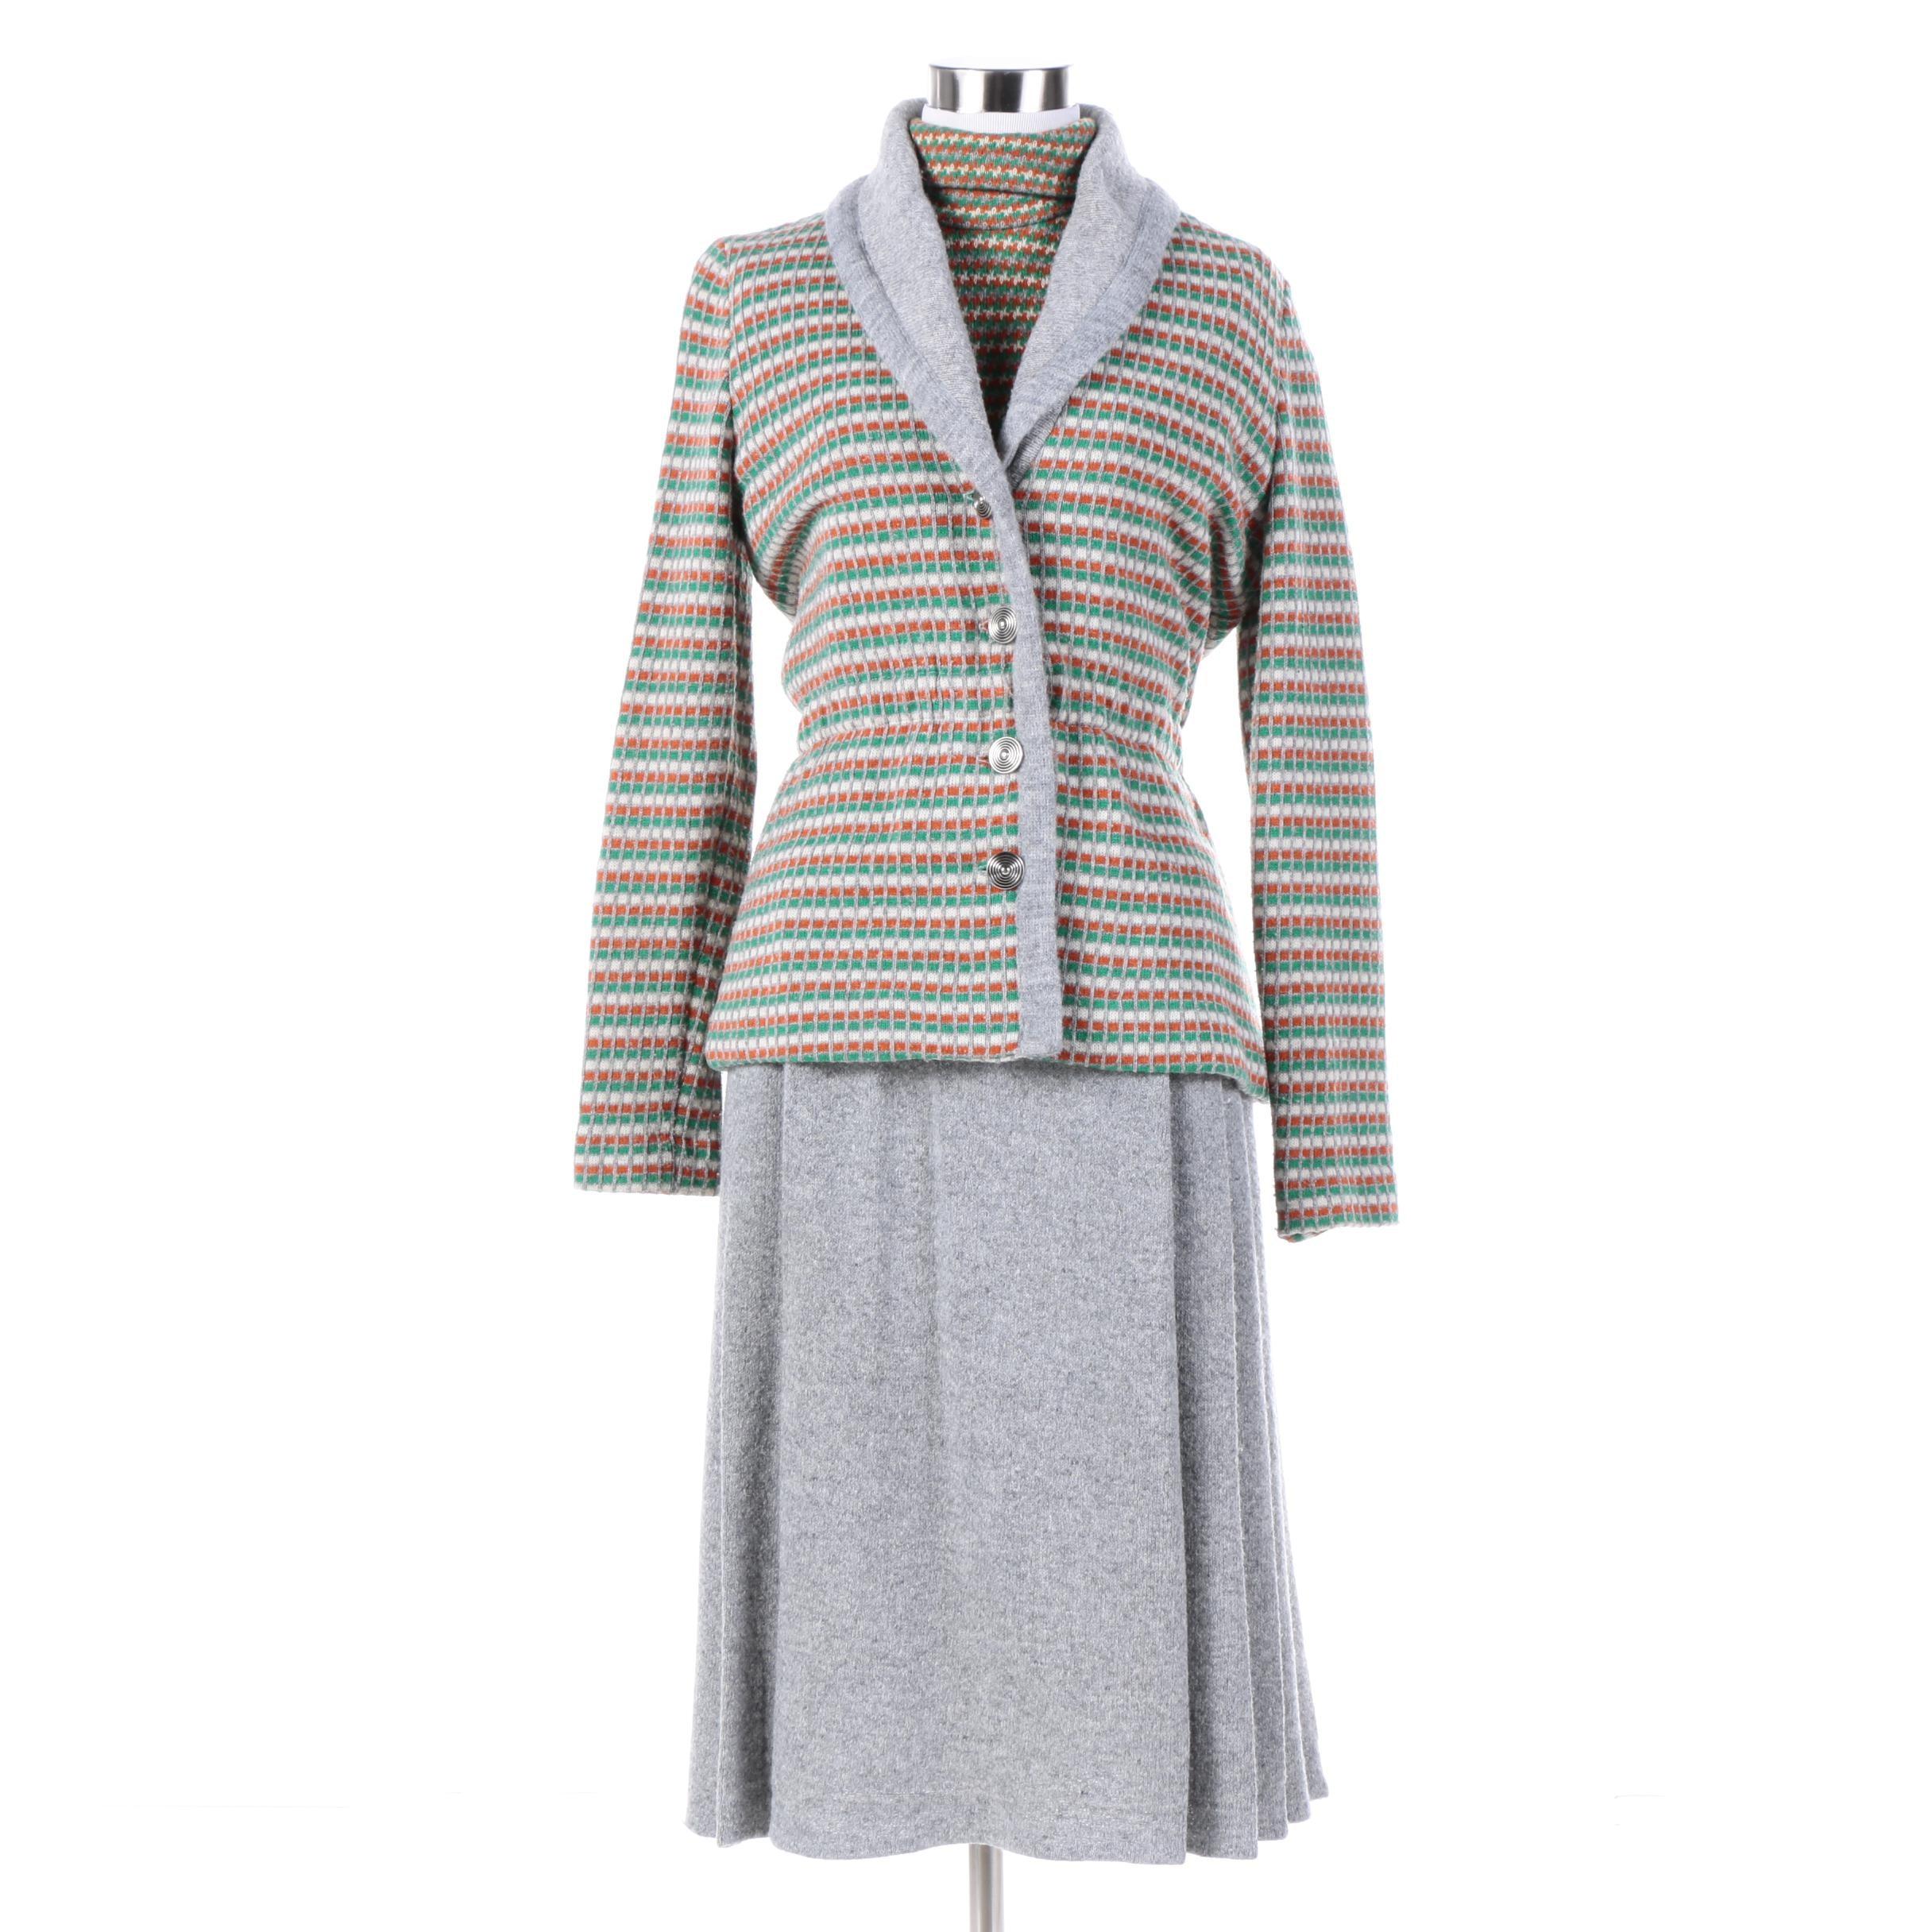 Women S Vintage Morton Miles For Smith And Jones Knit Dress Suit Ebth